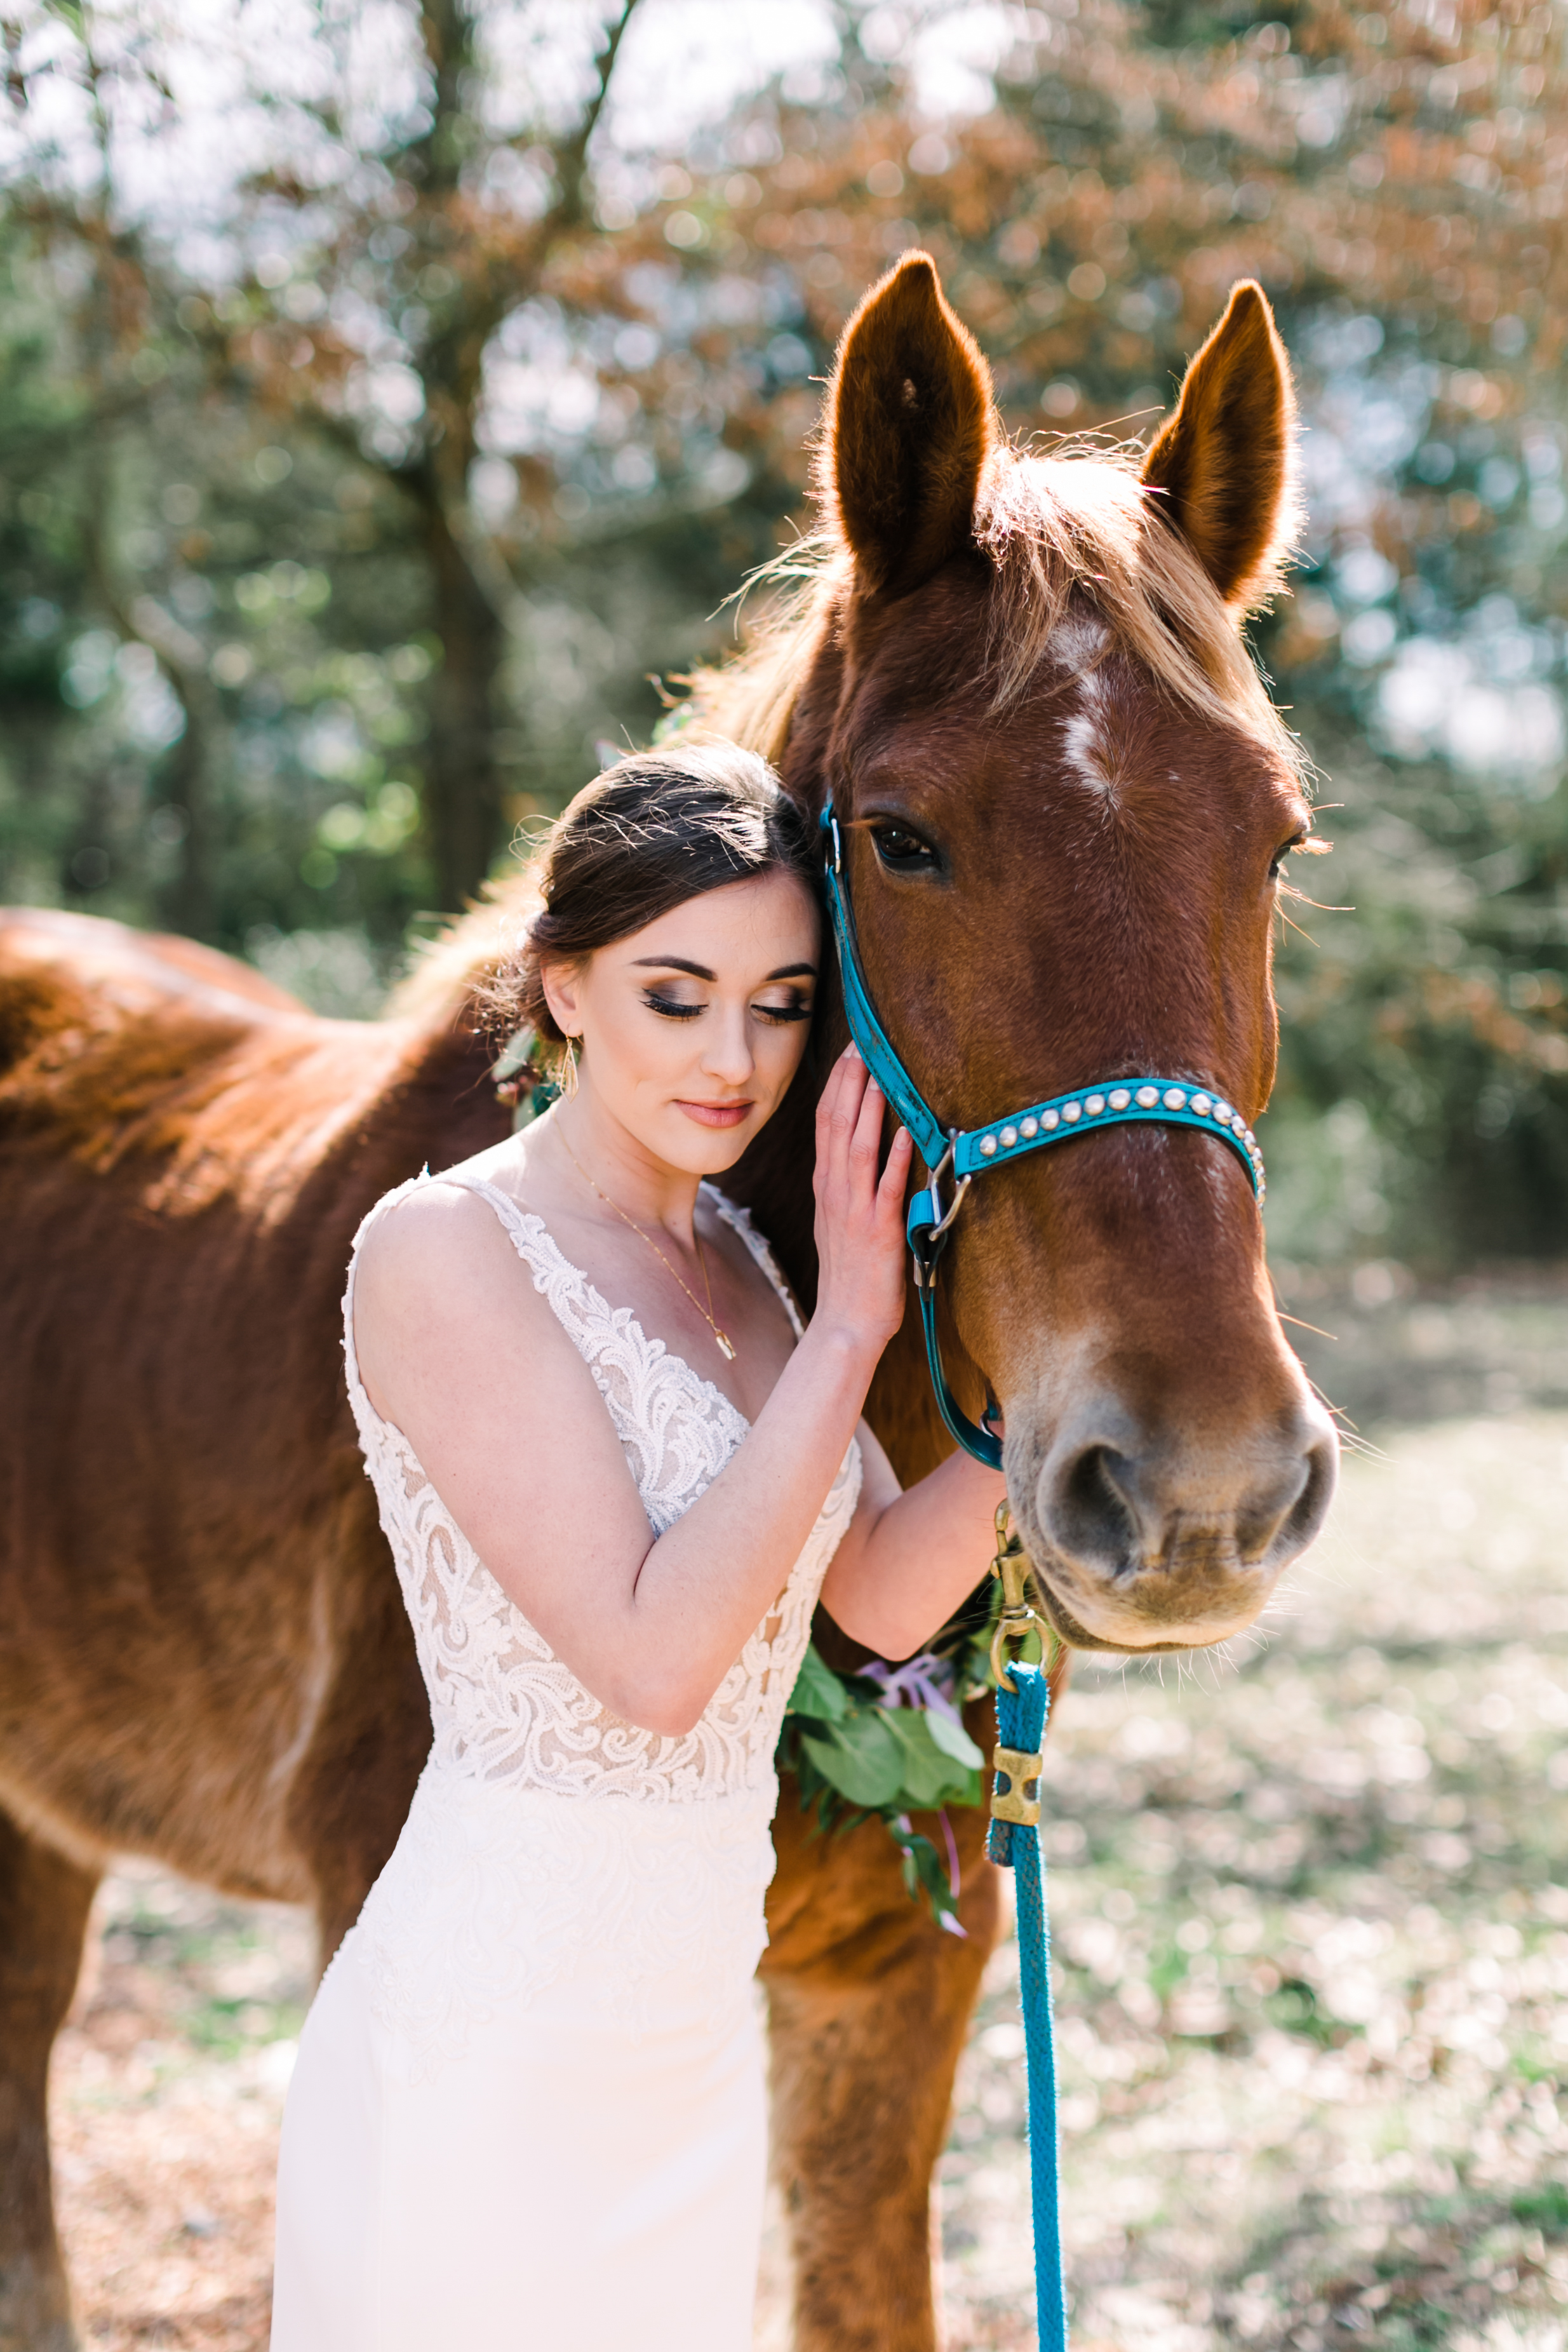 romantic+valentines+day+wedding+horses (6 of 10).jpg